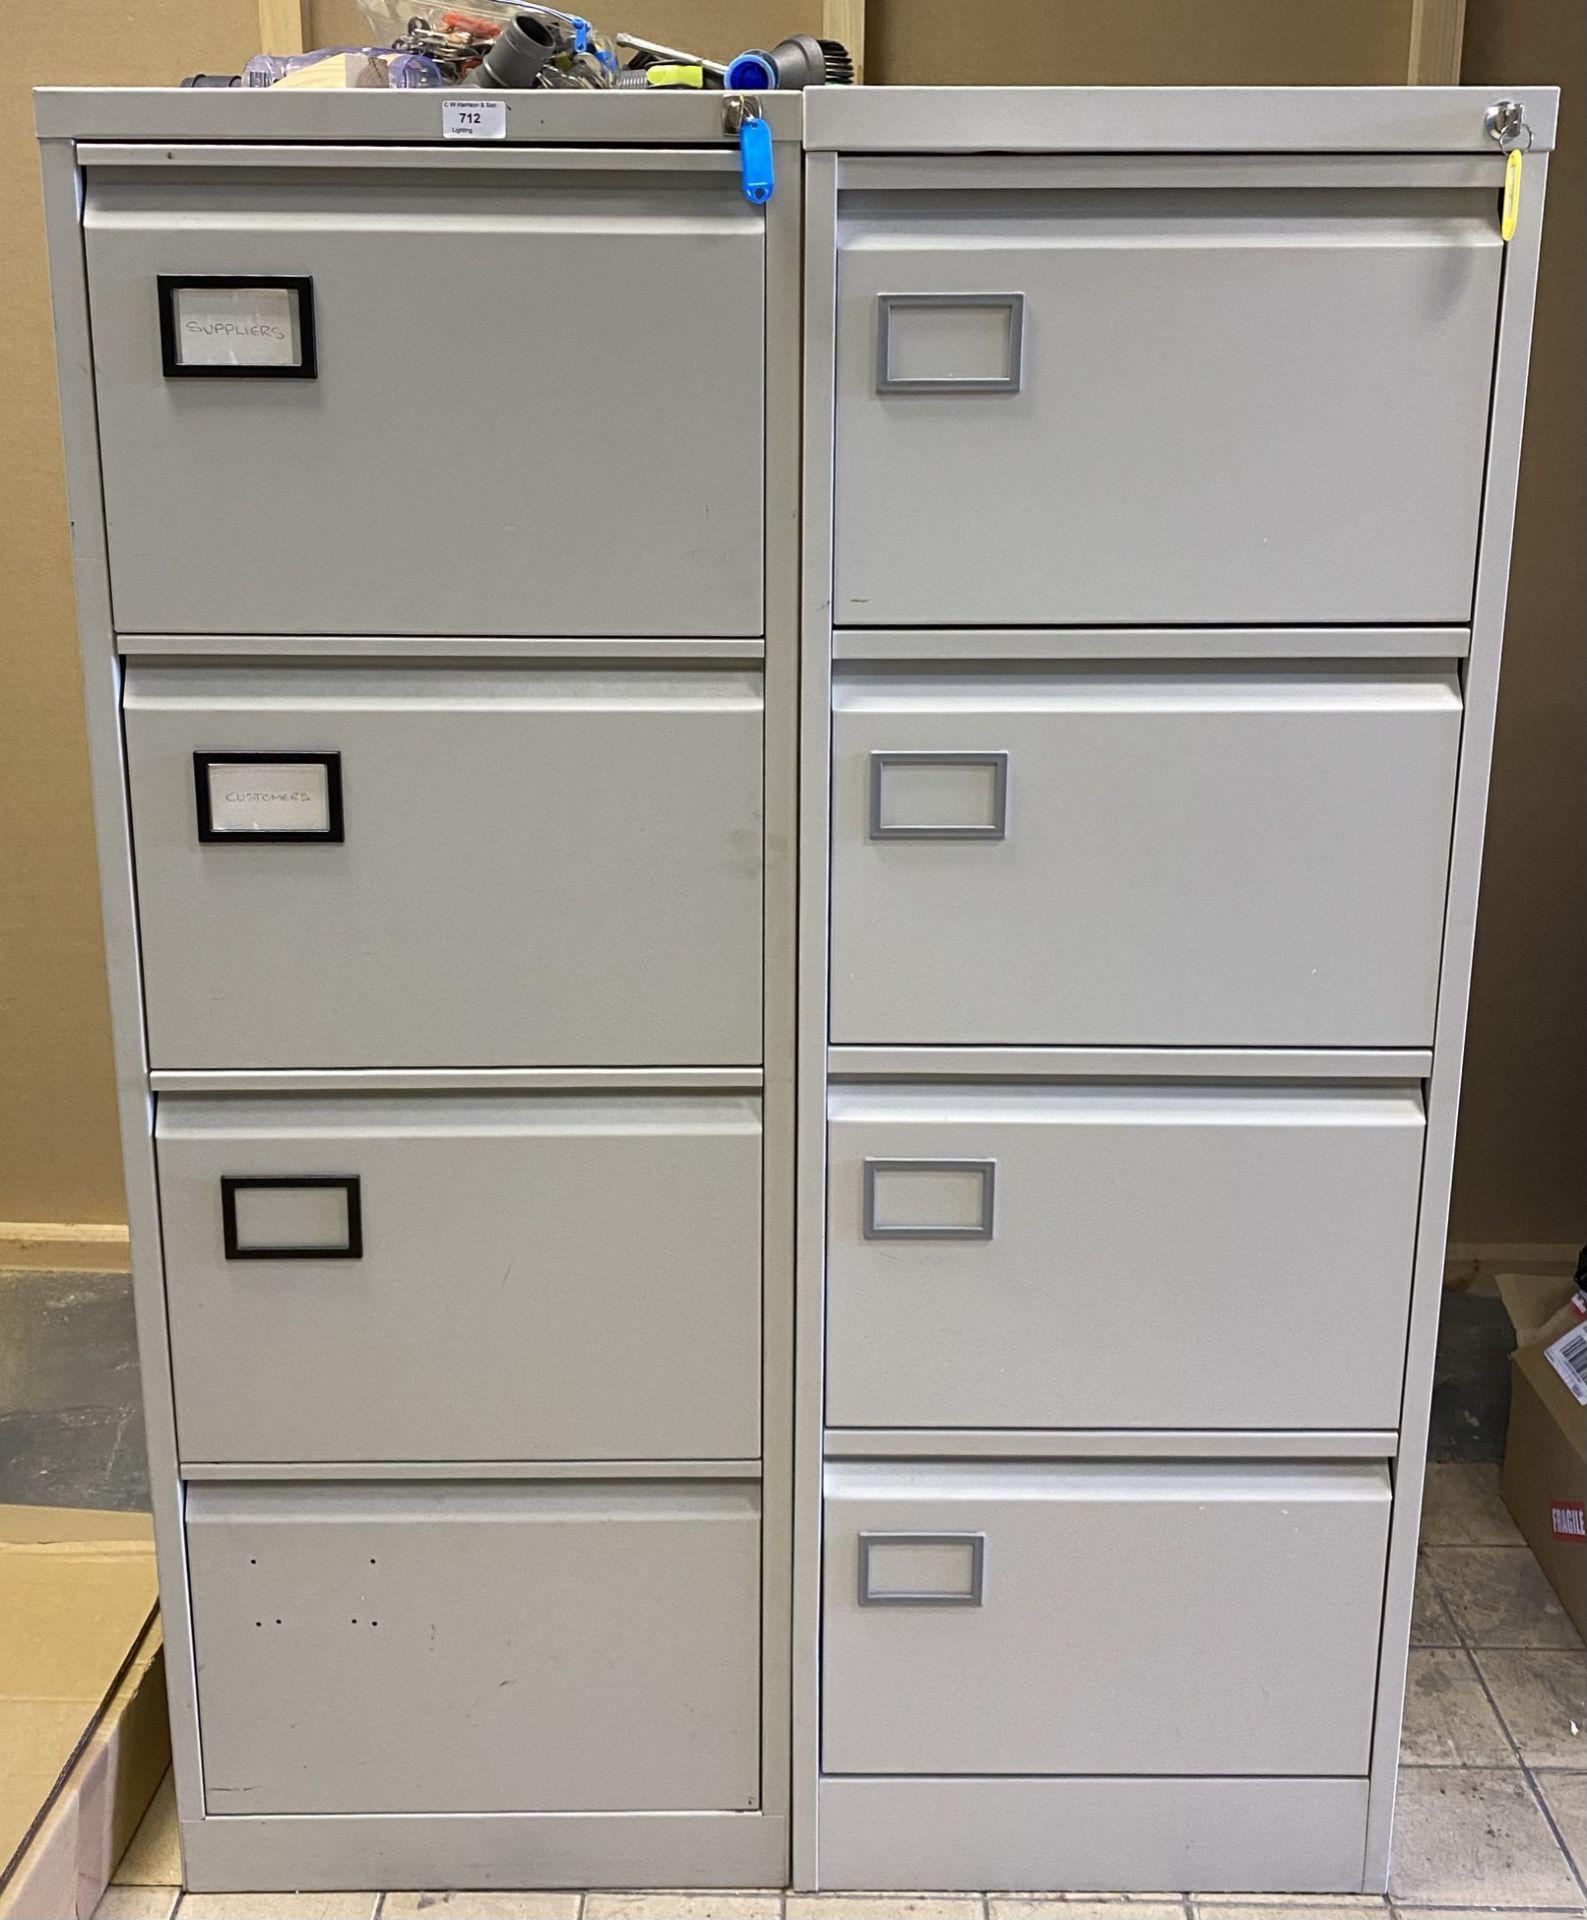 2 x 4 drawer, grey metal filing cabinets